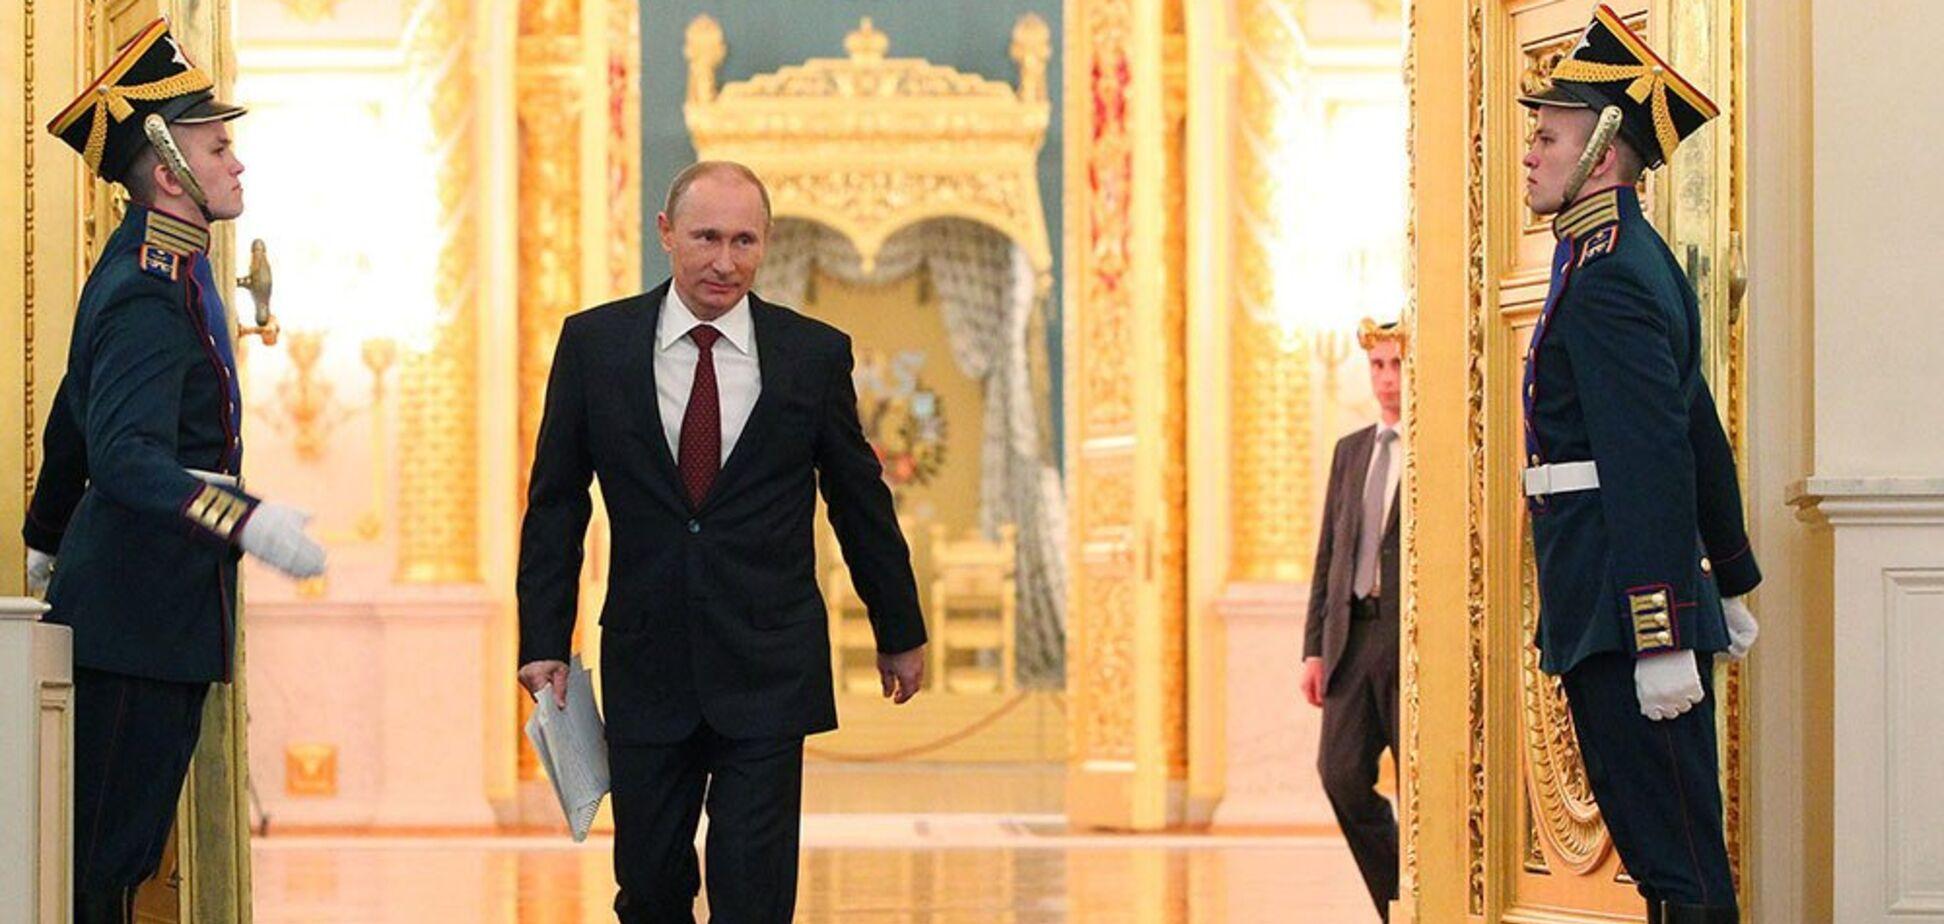 У власти до гроба: как Путин повторяет судьбу Сталина